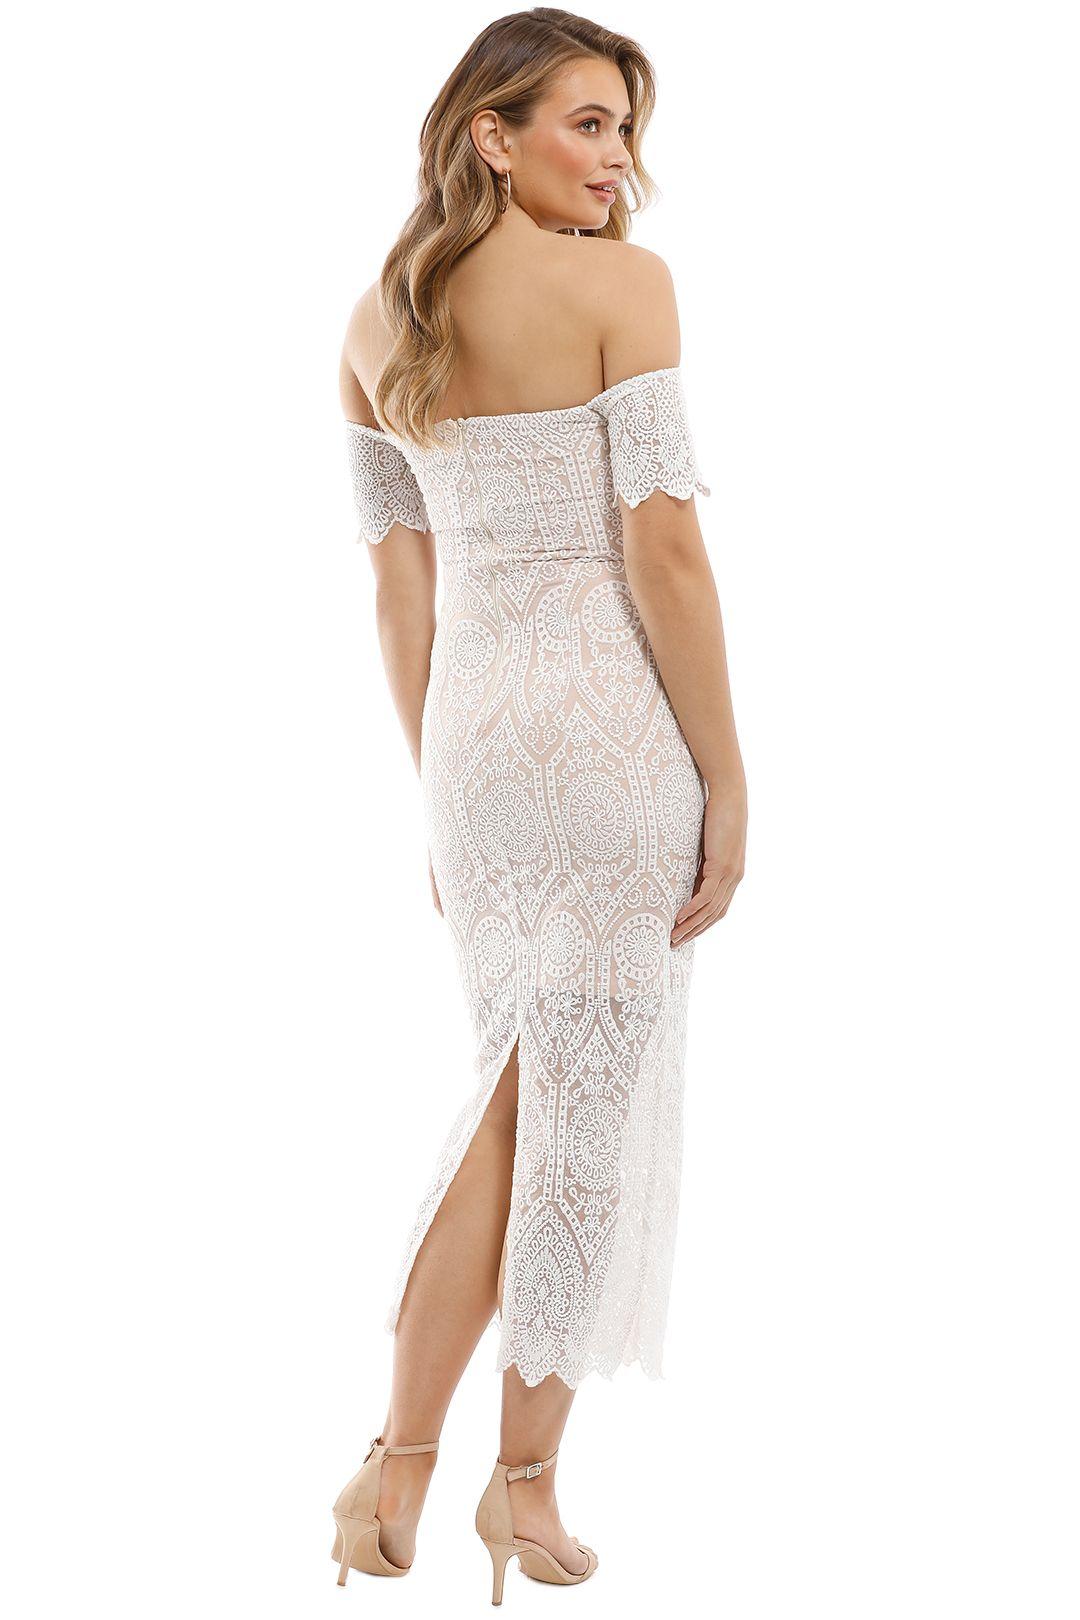 Elle Zeitoune - Emmanuelle Dress - White - Back